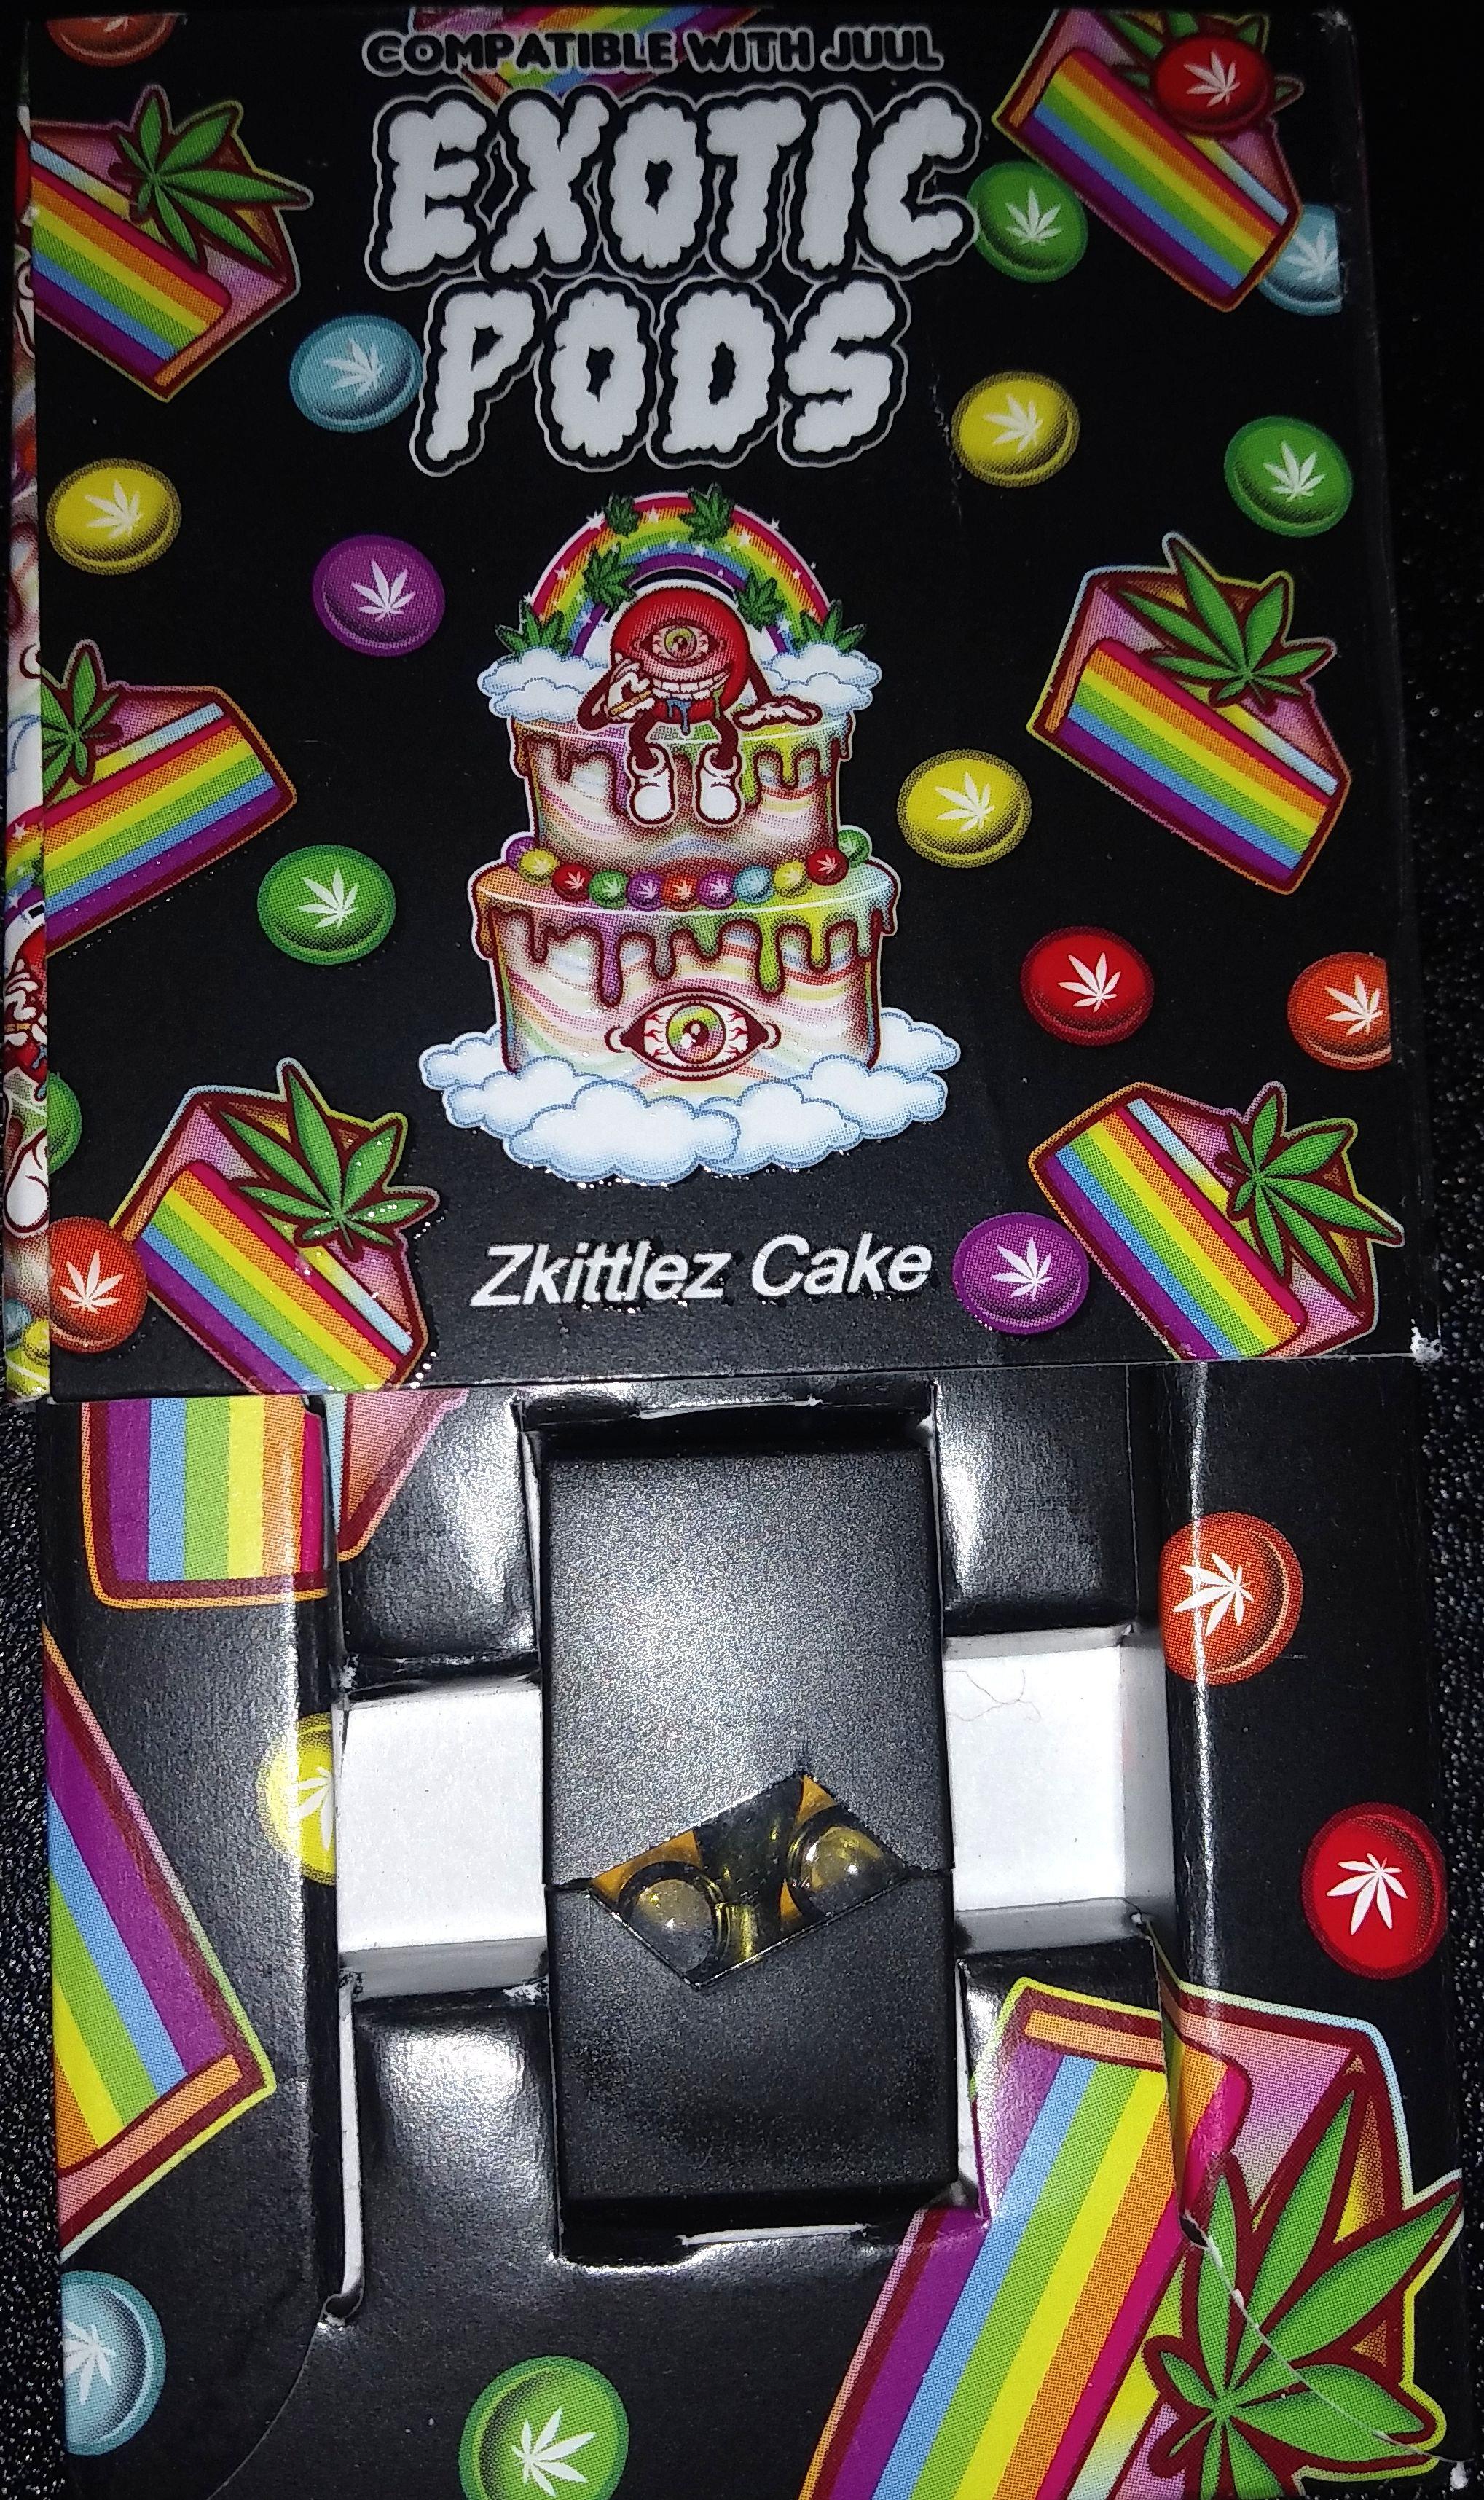 Skittles Cake Exotic Pods Home Birthday Juul